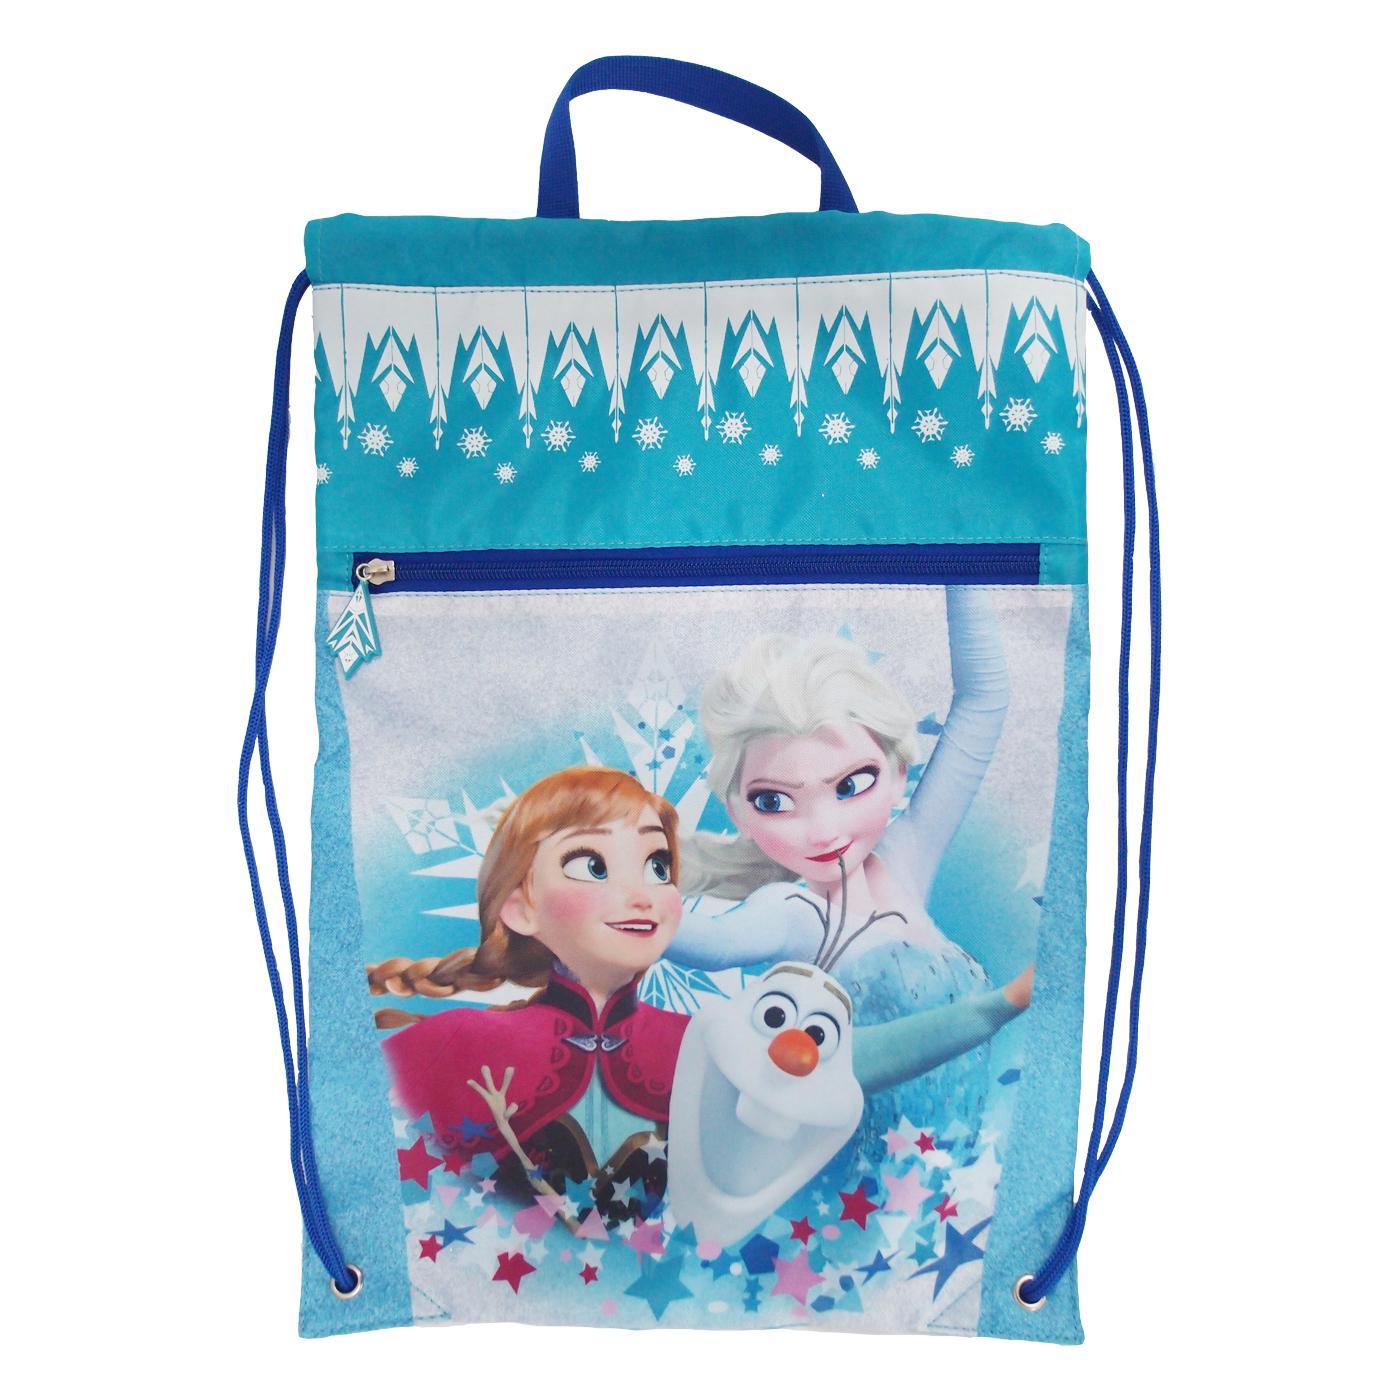 Frozen Drawstring Bag